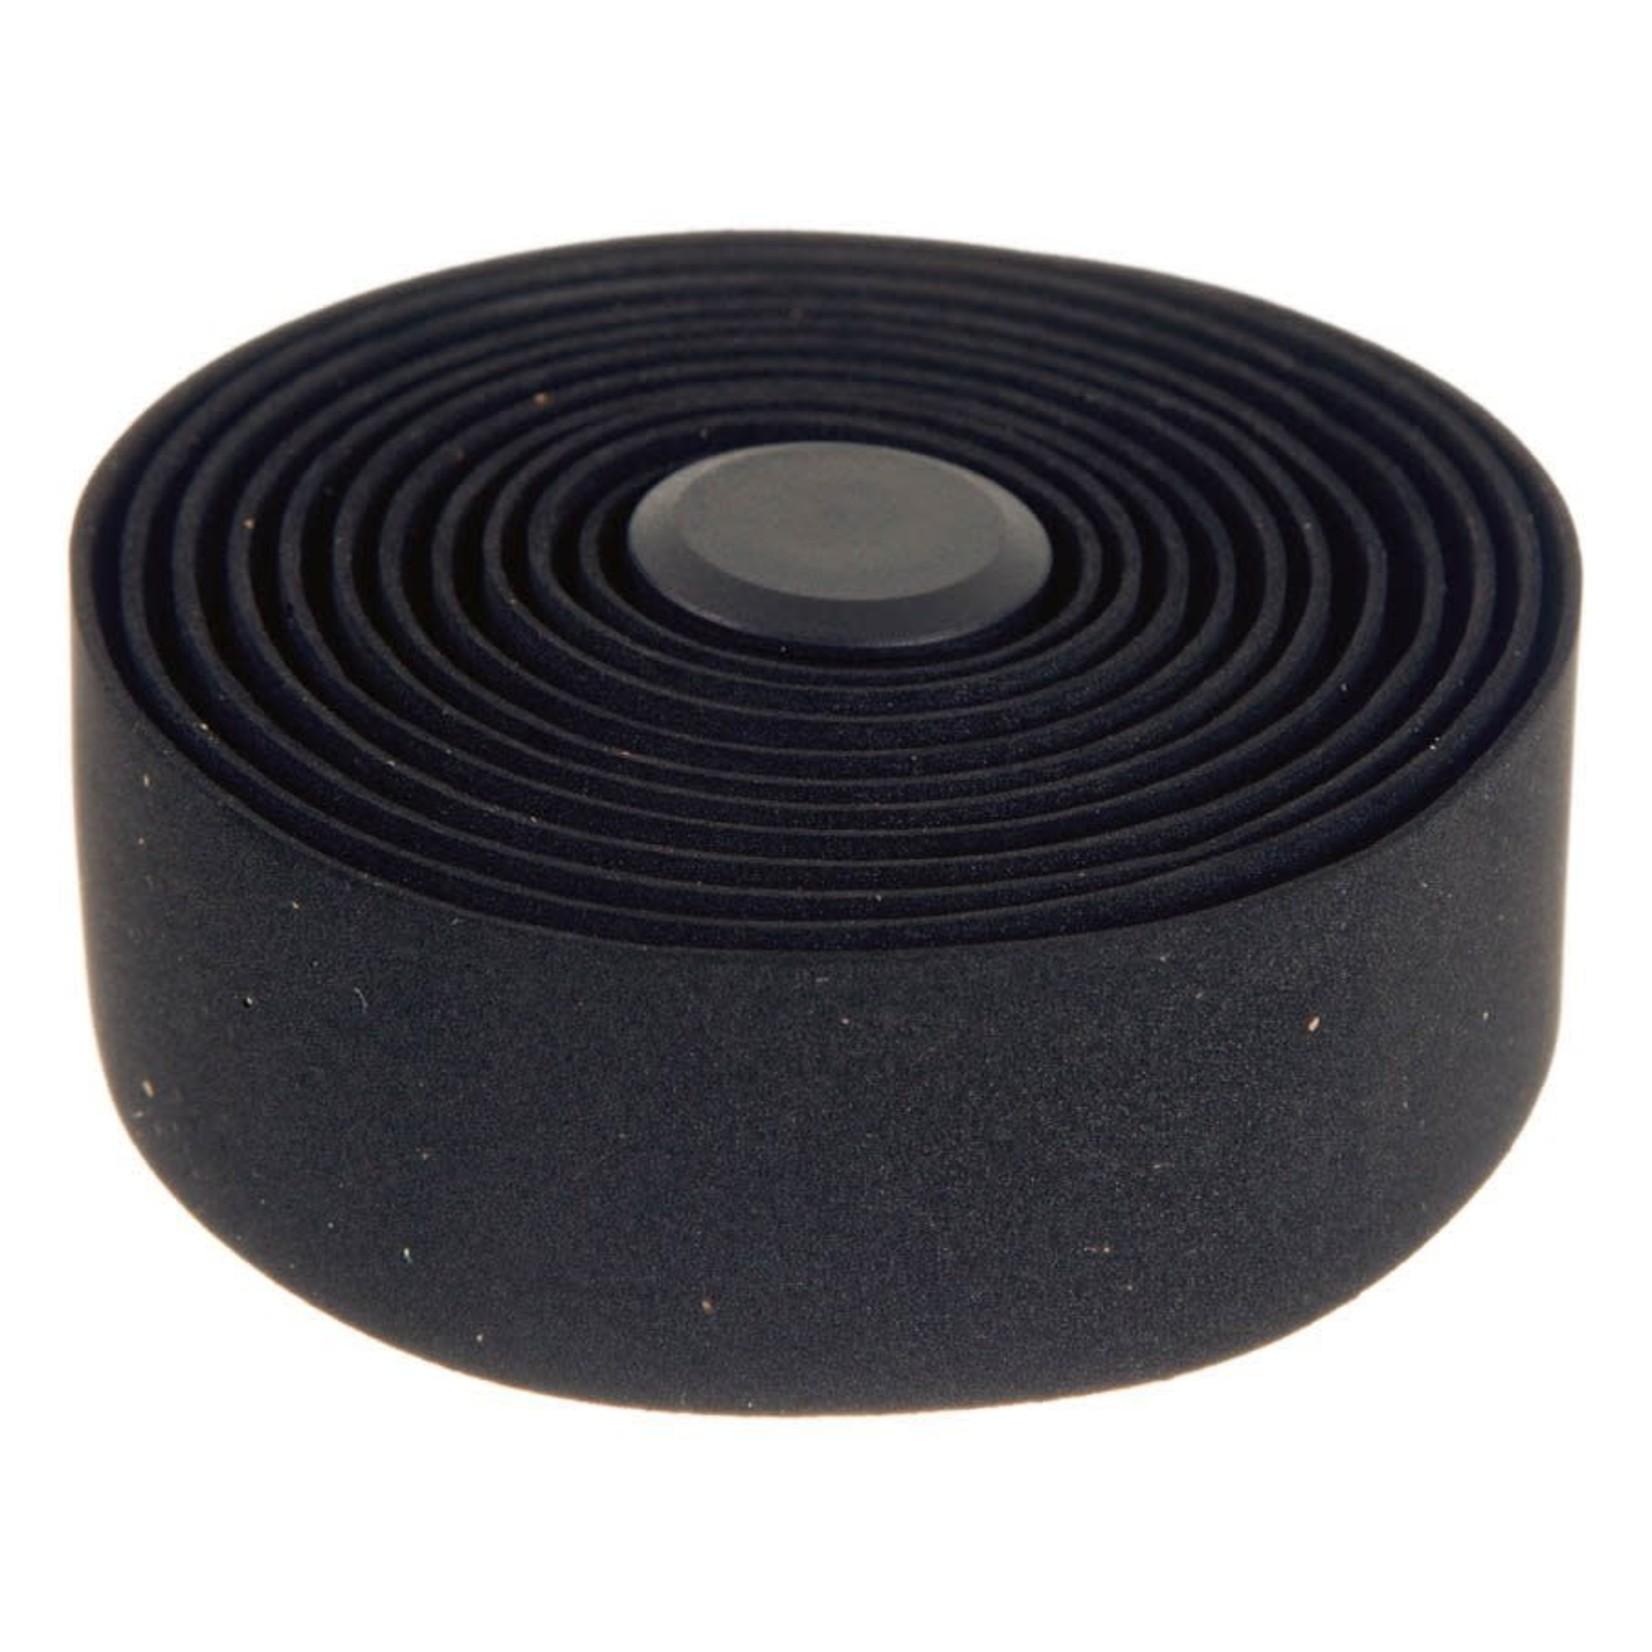 Evo Wind-Up Classic, Cork Tape, Black